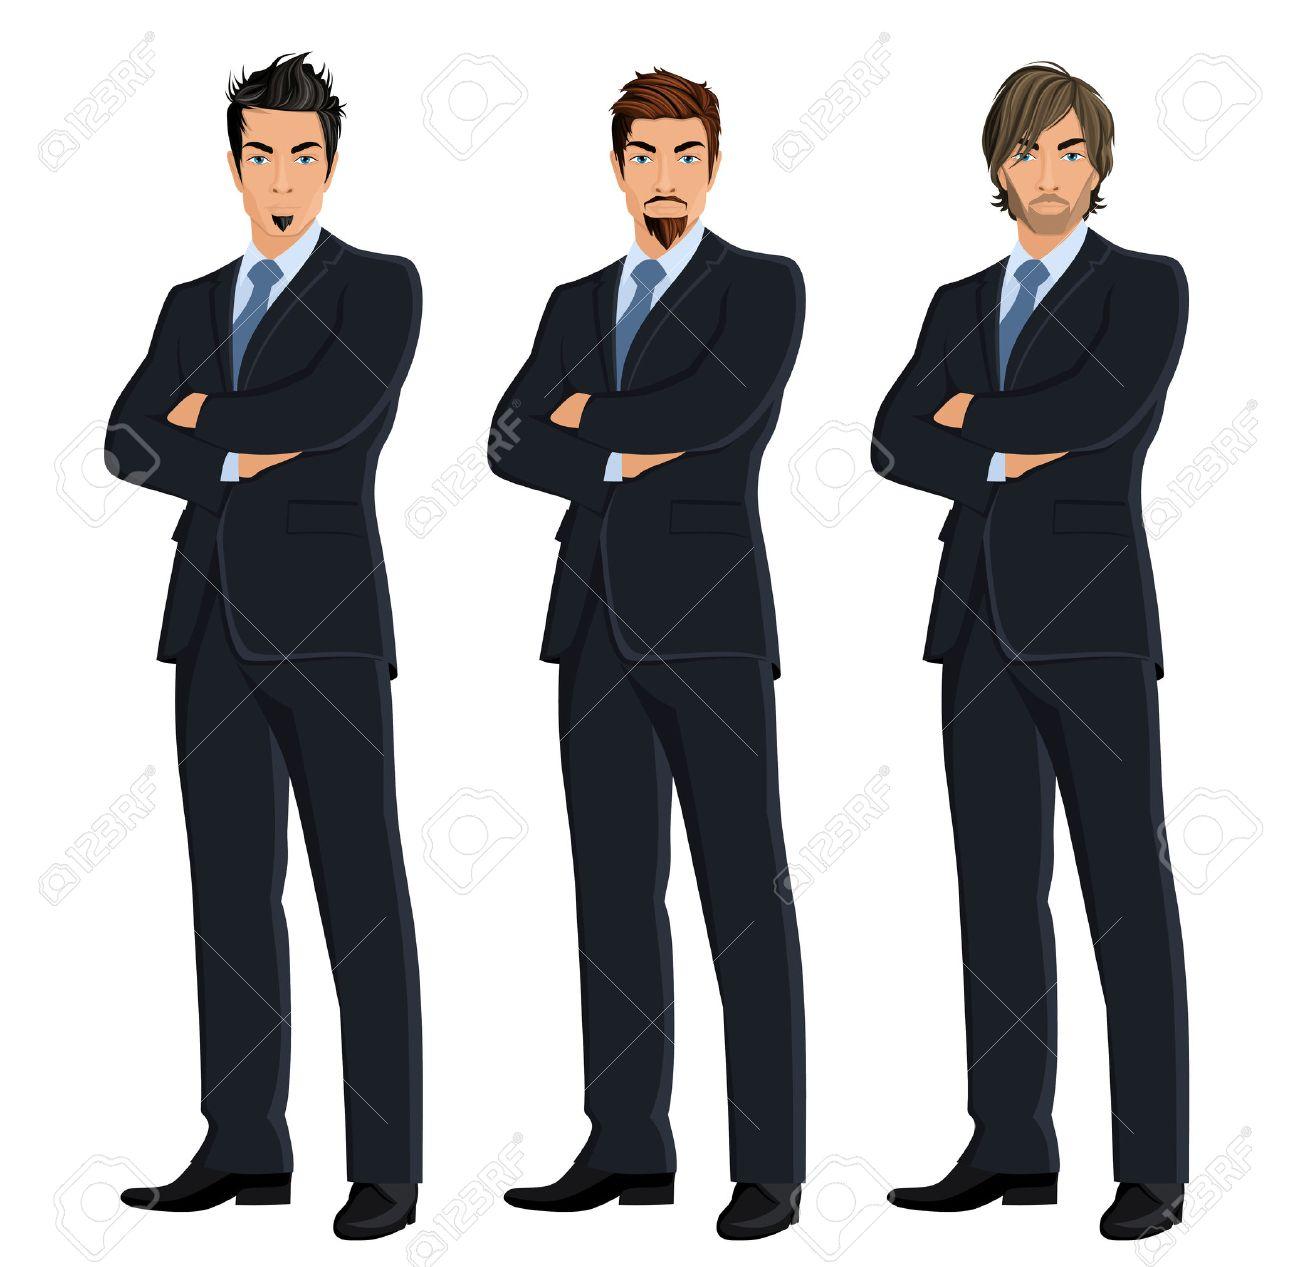 Set of full length body business man isolated on white background vector illustration - 30056768